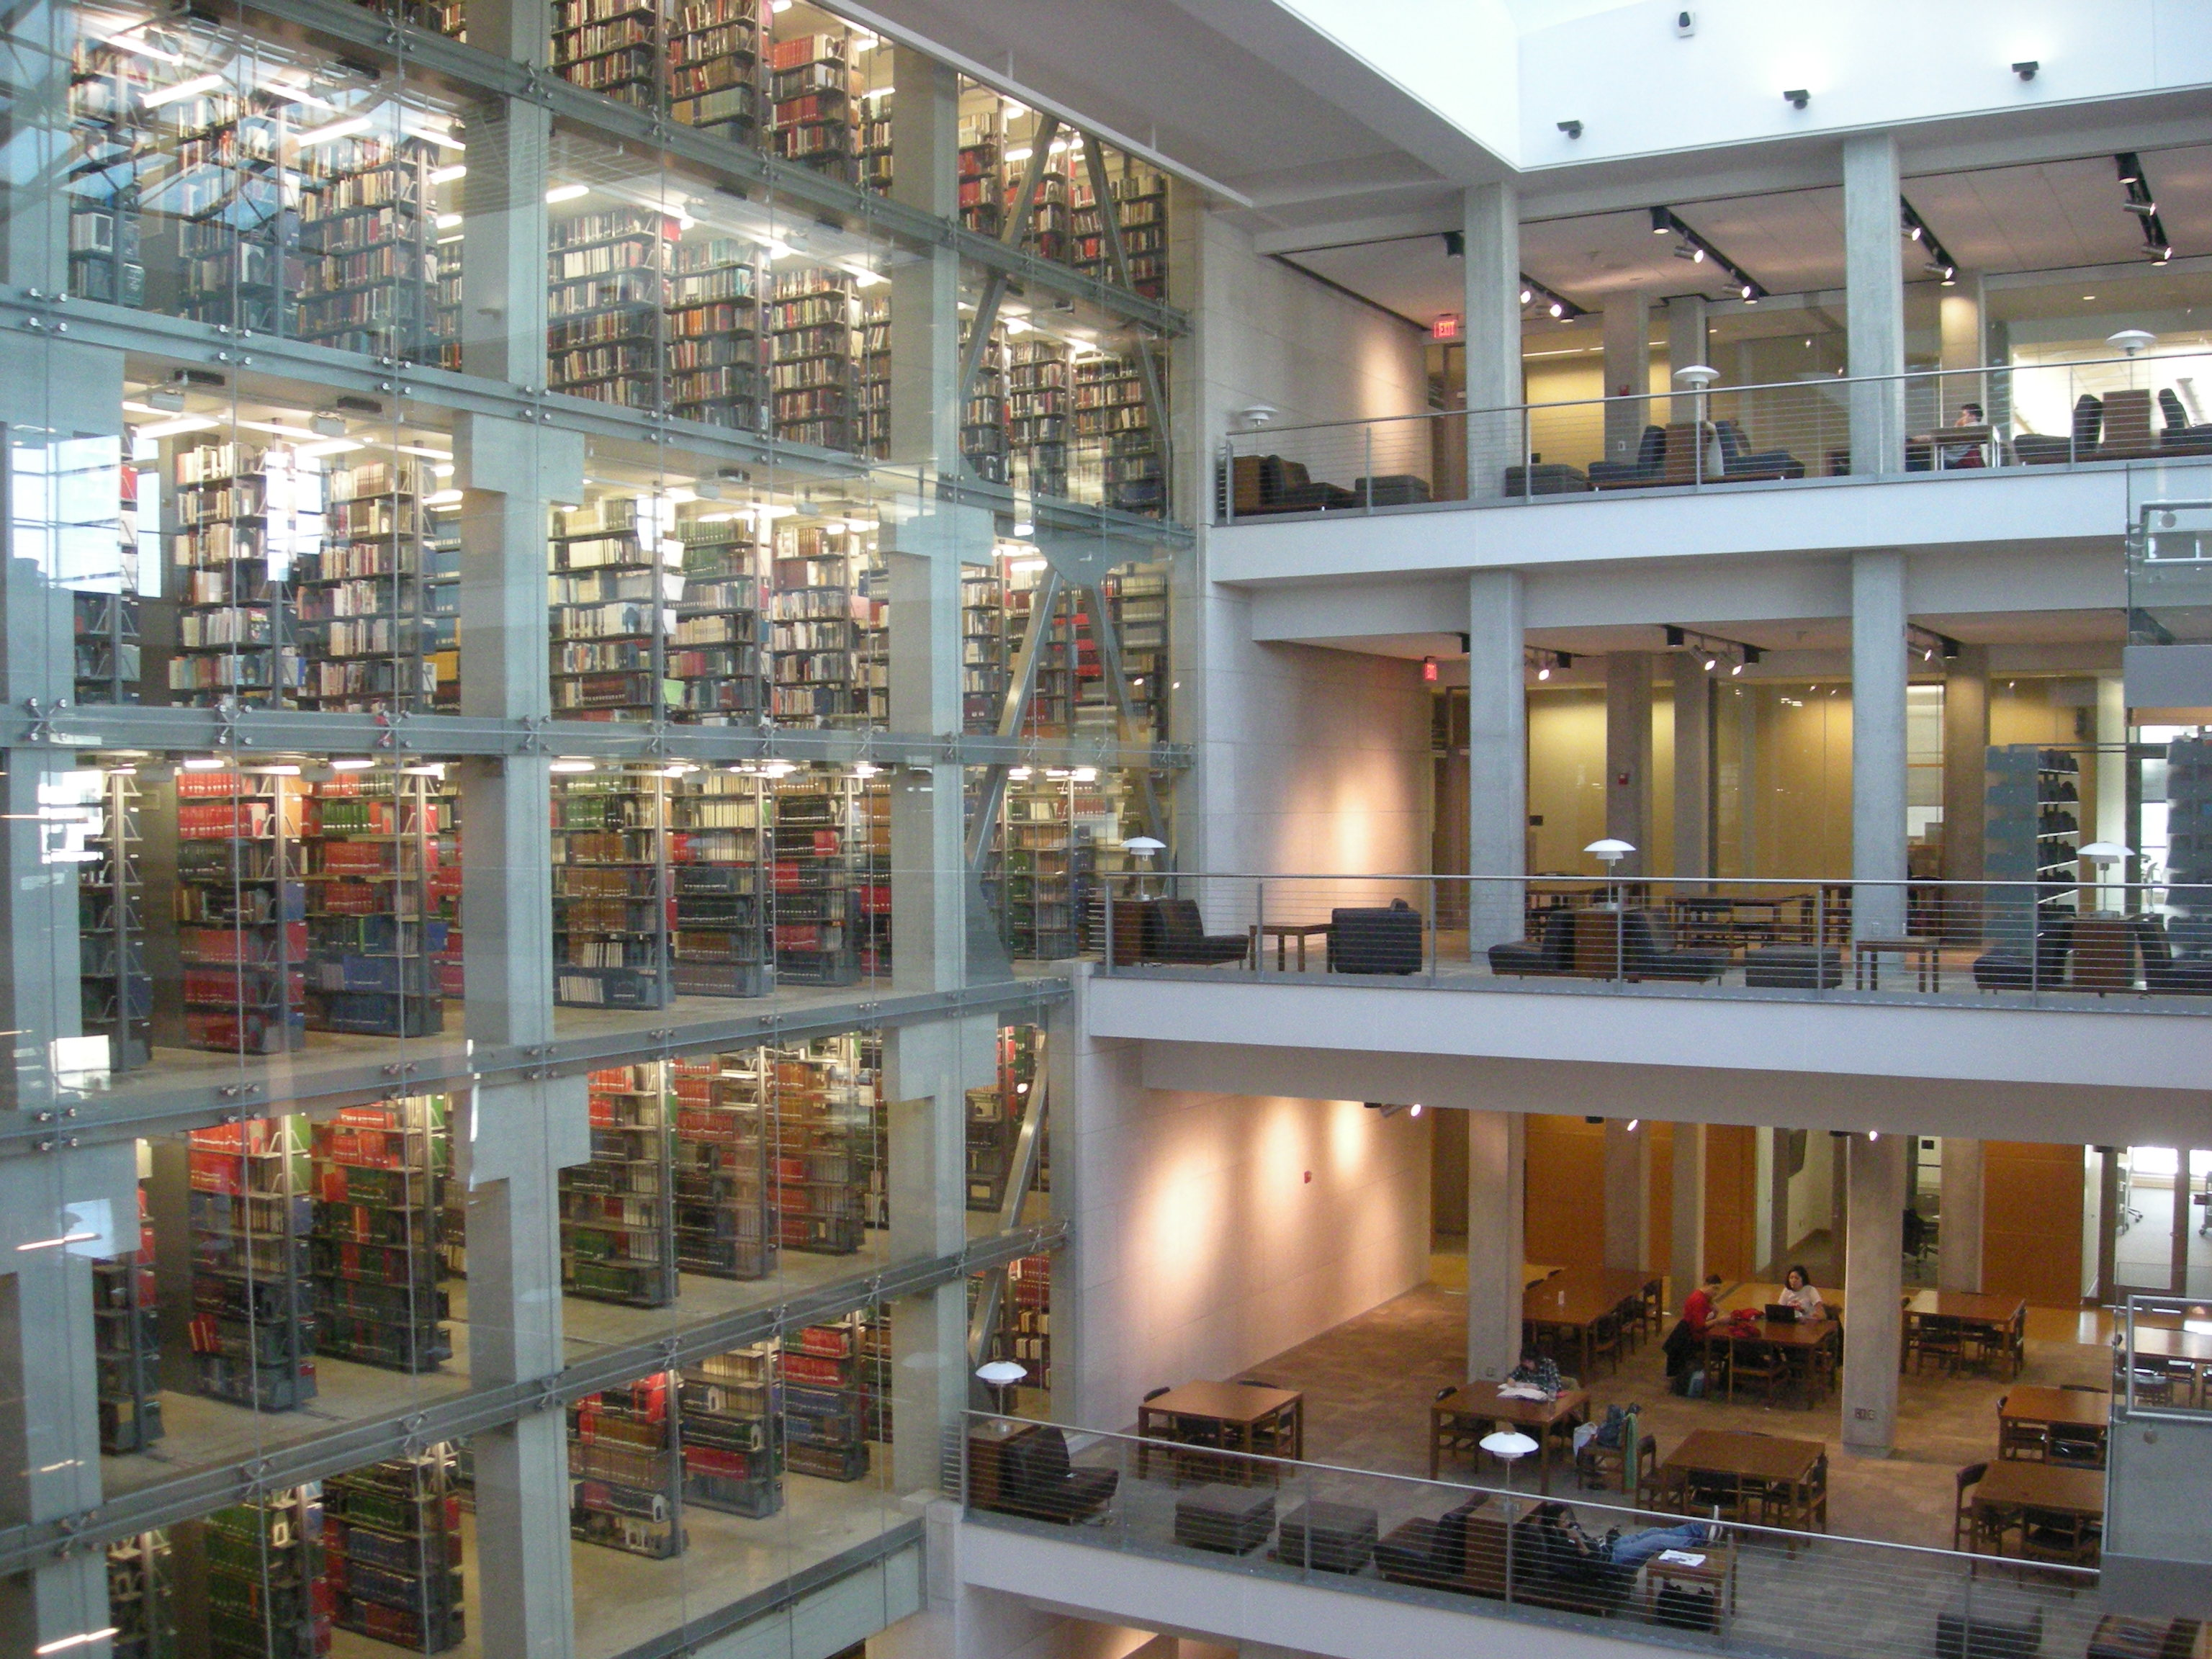 Thompson Library Room